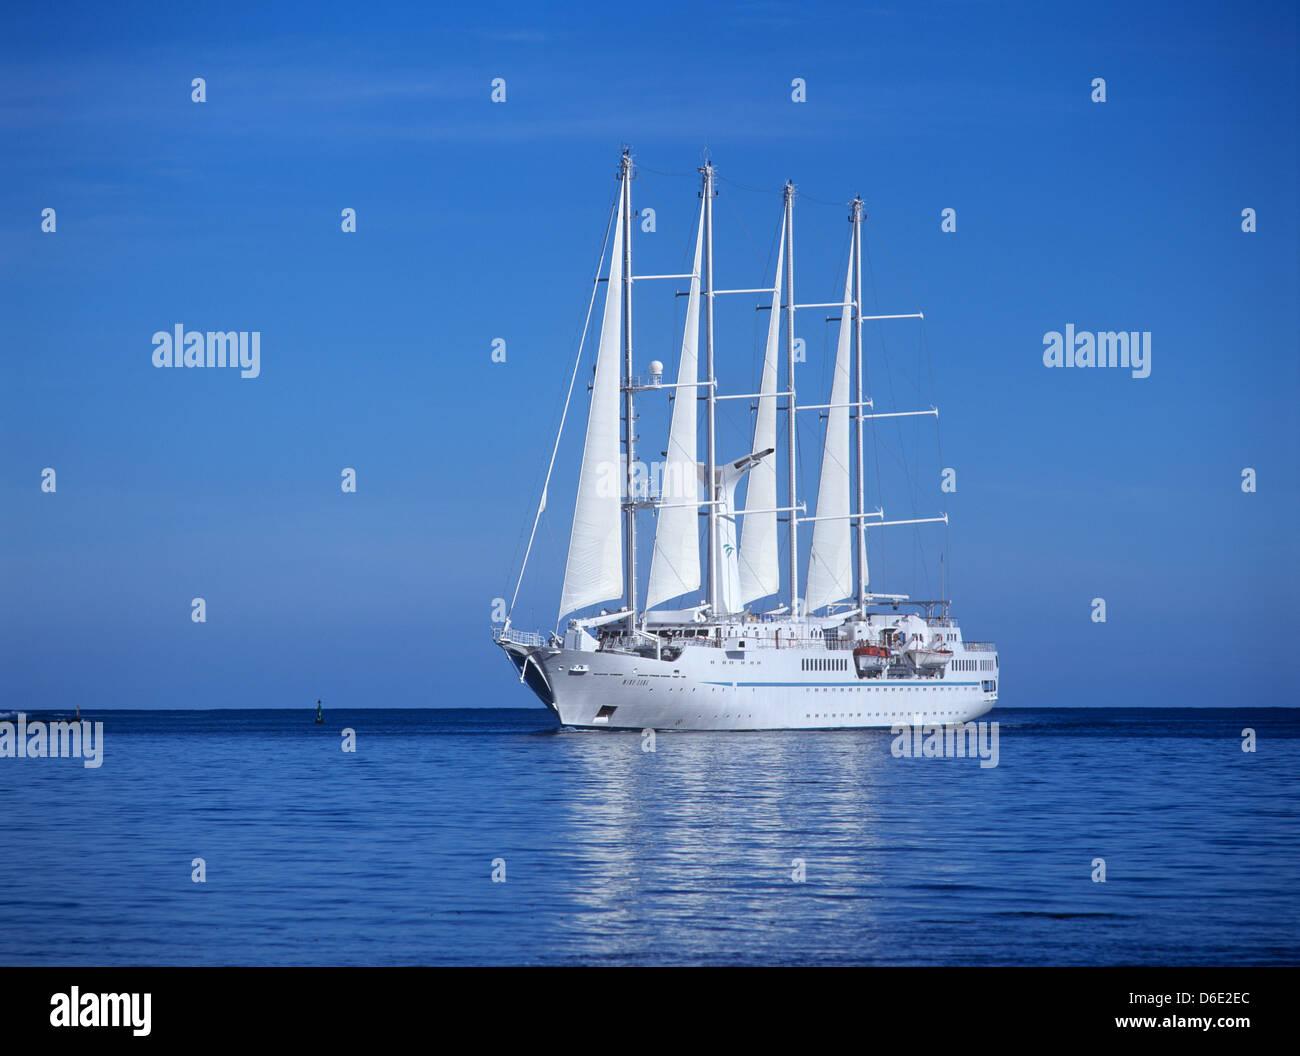 French Polynesia Society Islands Windward Islands Moorea - Windsong cruise ship